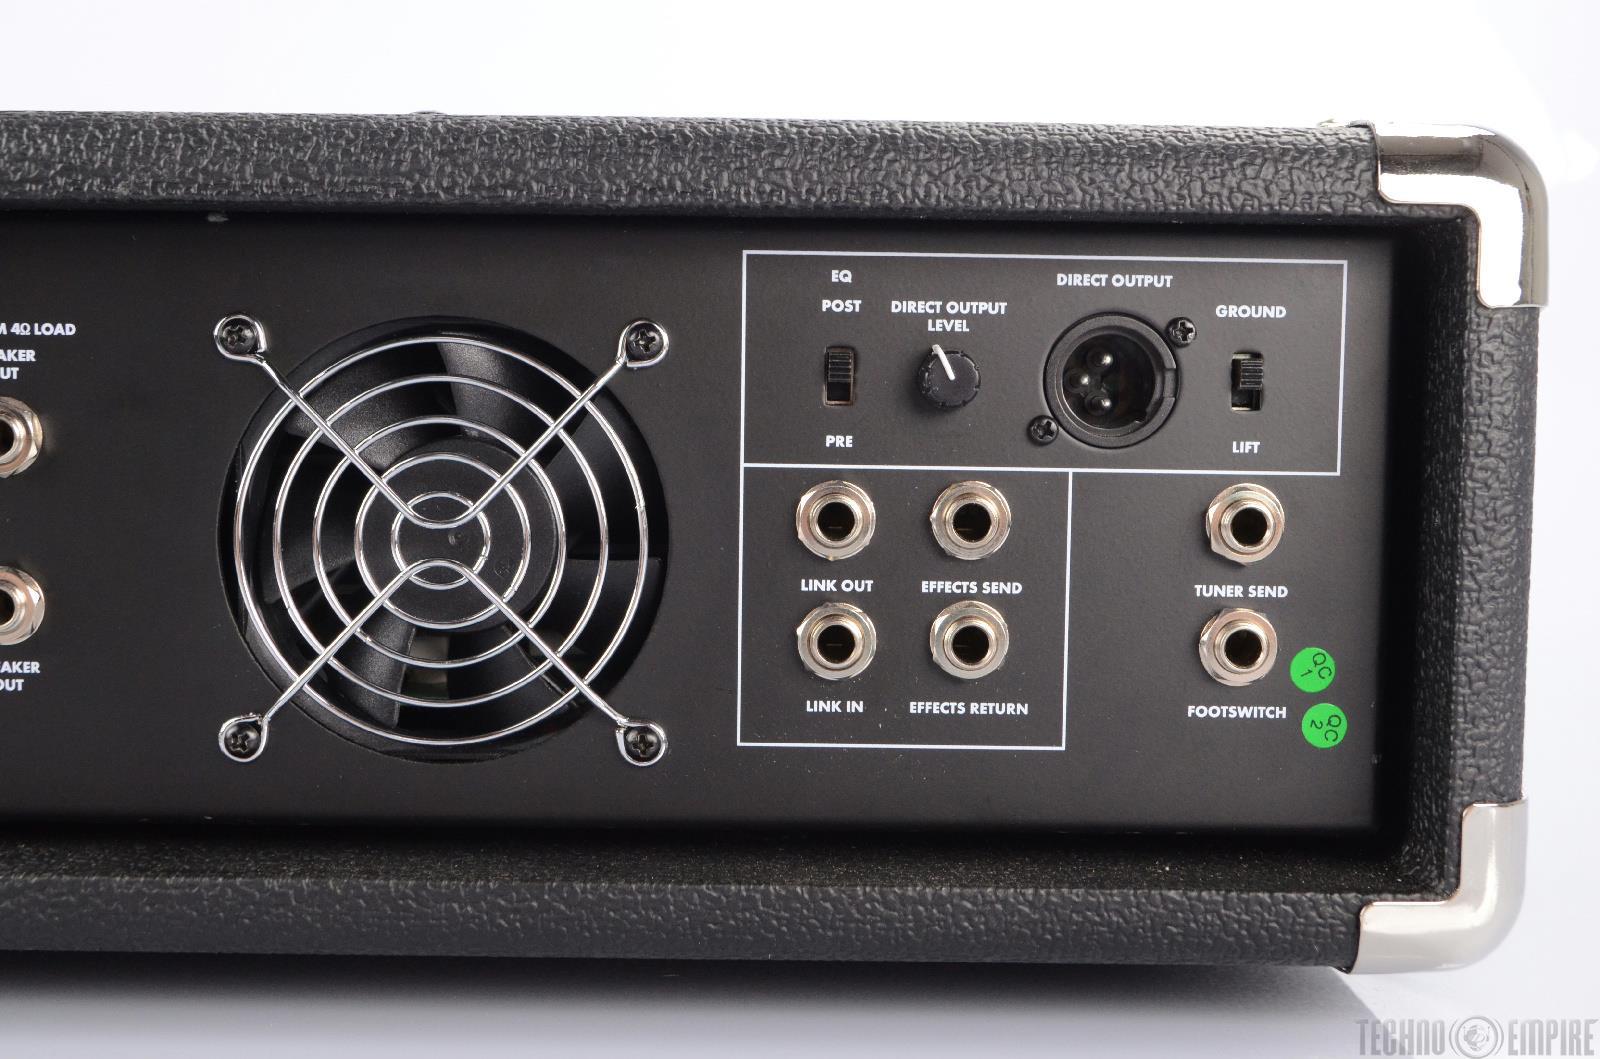 acoustic b800h 800w bass guitar amplifier amp head new 21830 ebay. Black Bedroom Furniture Sets. Home Design Ideas